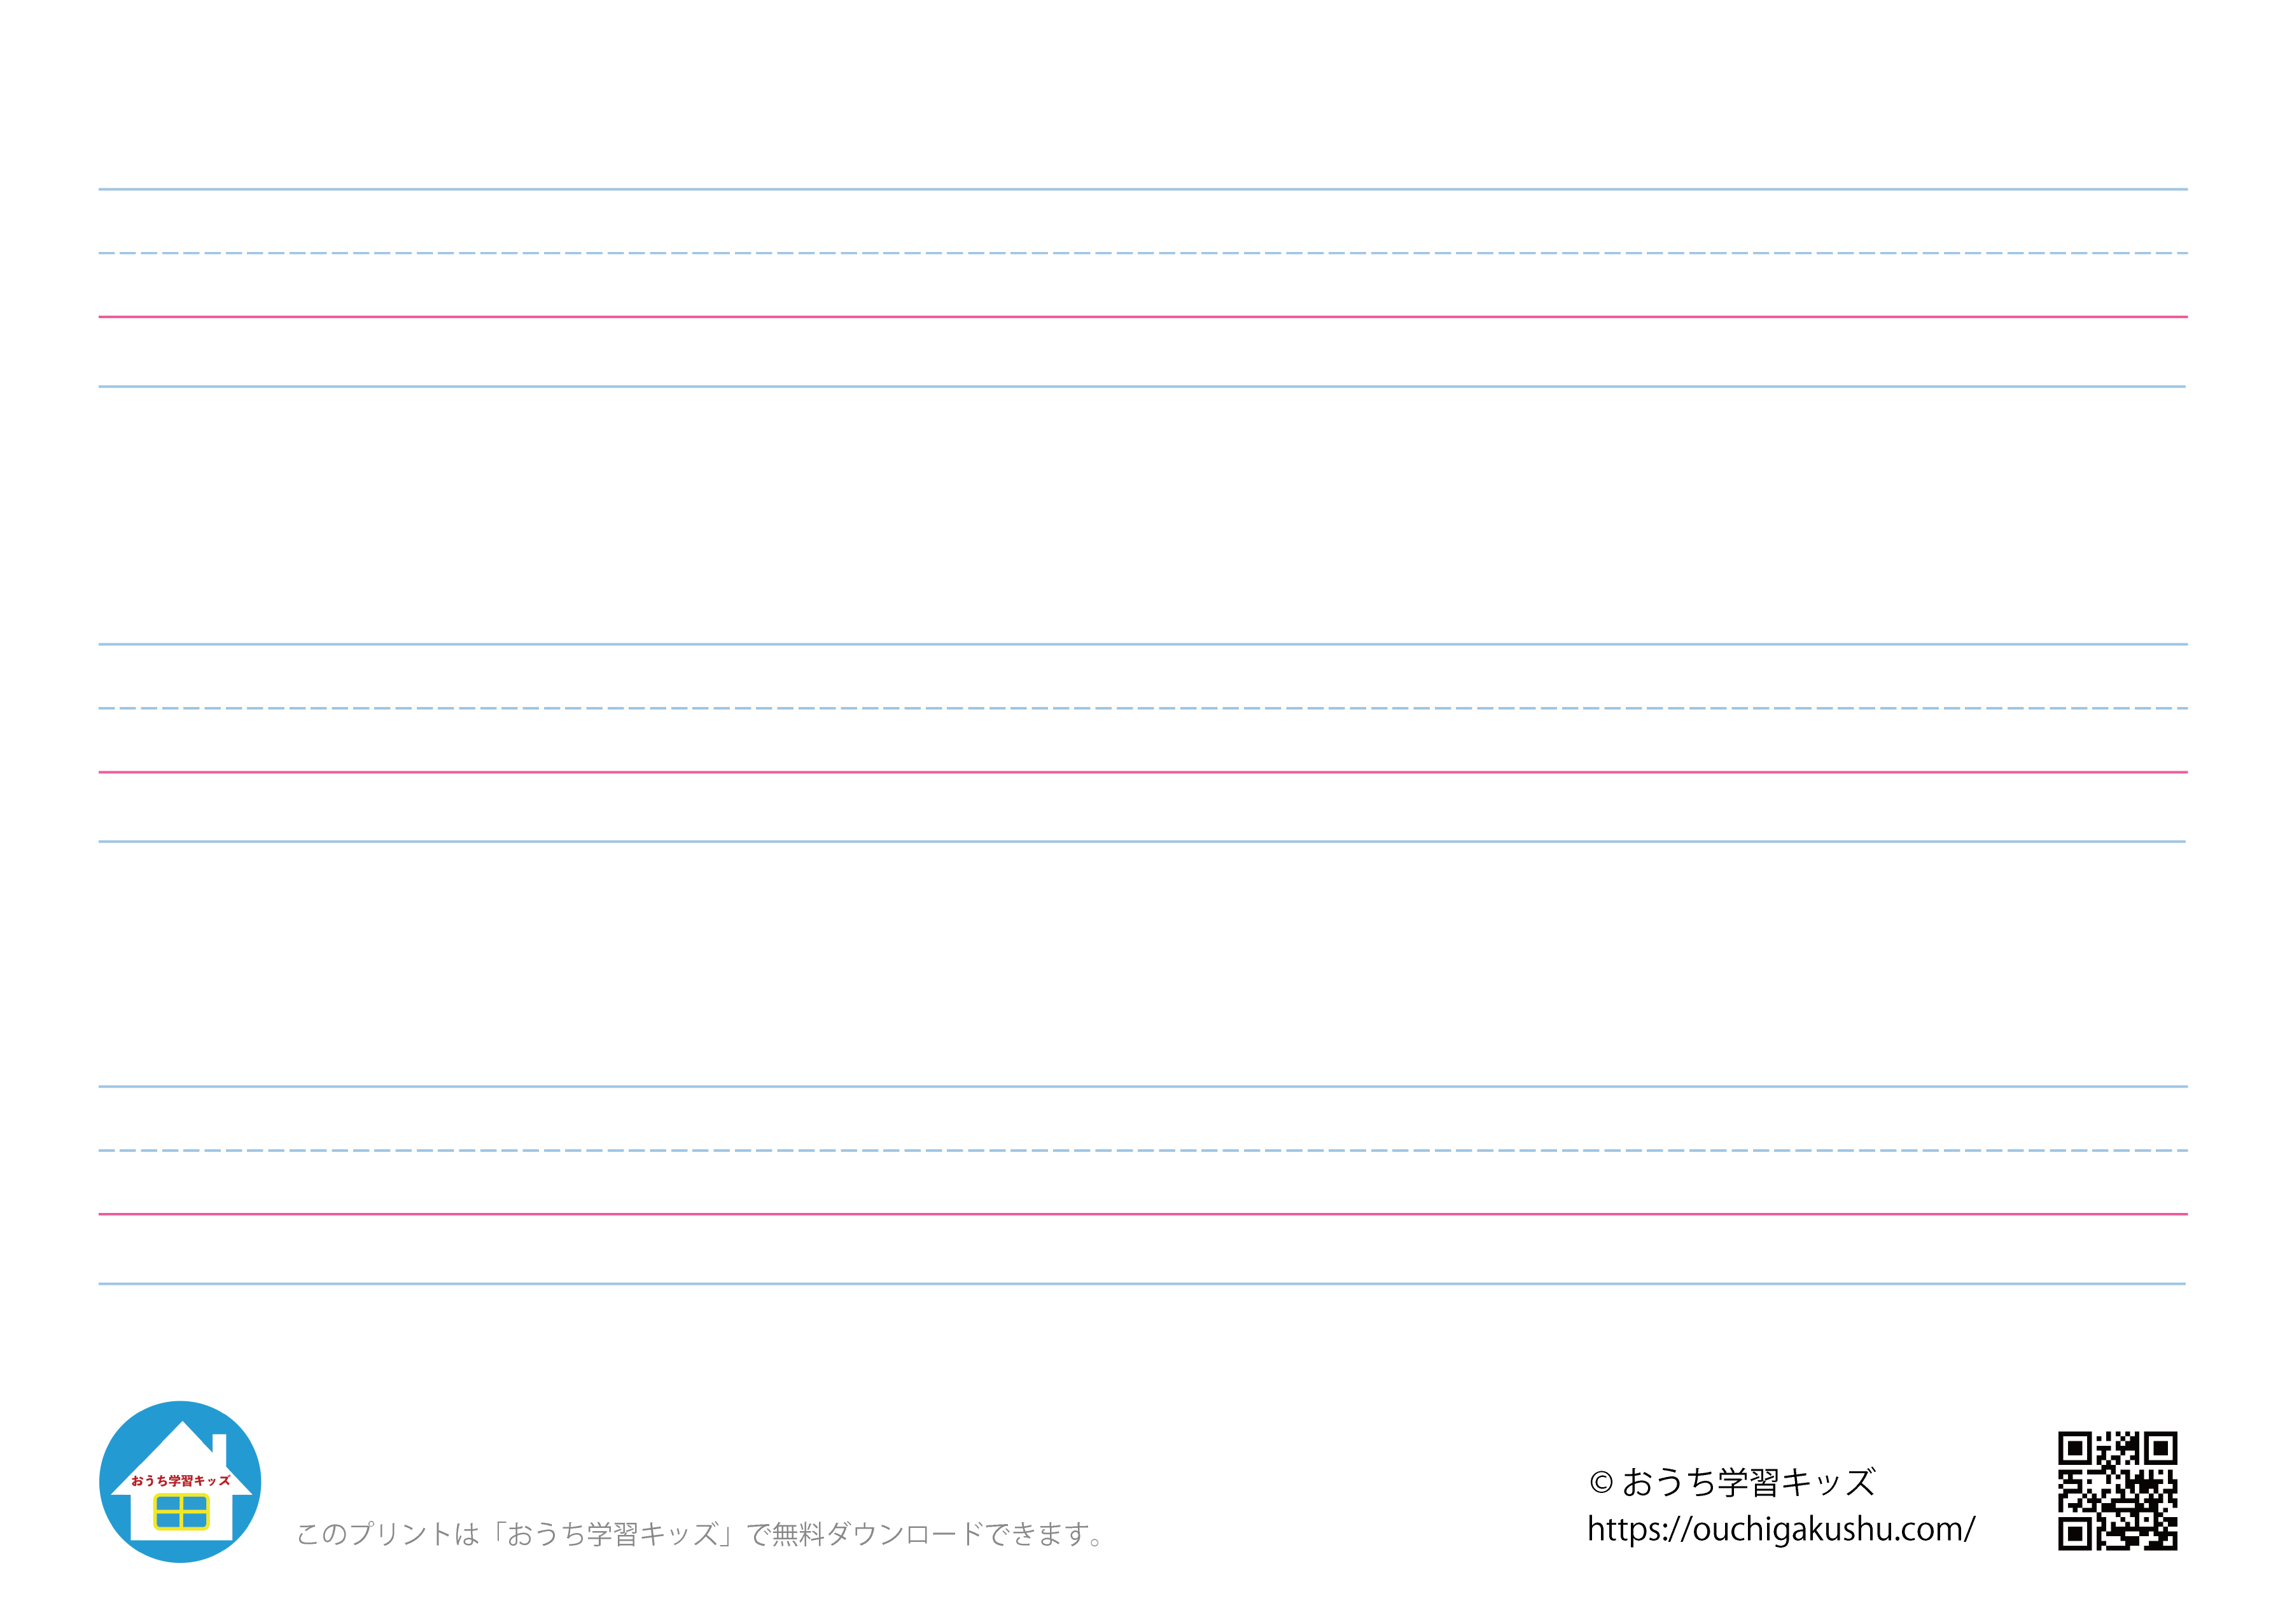 英語罫線ノート 3行(用紙:横)